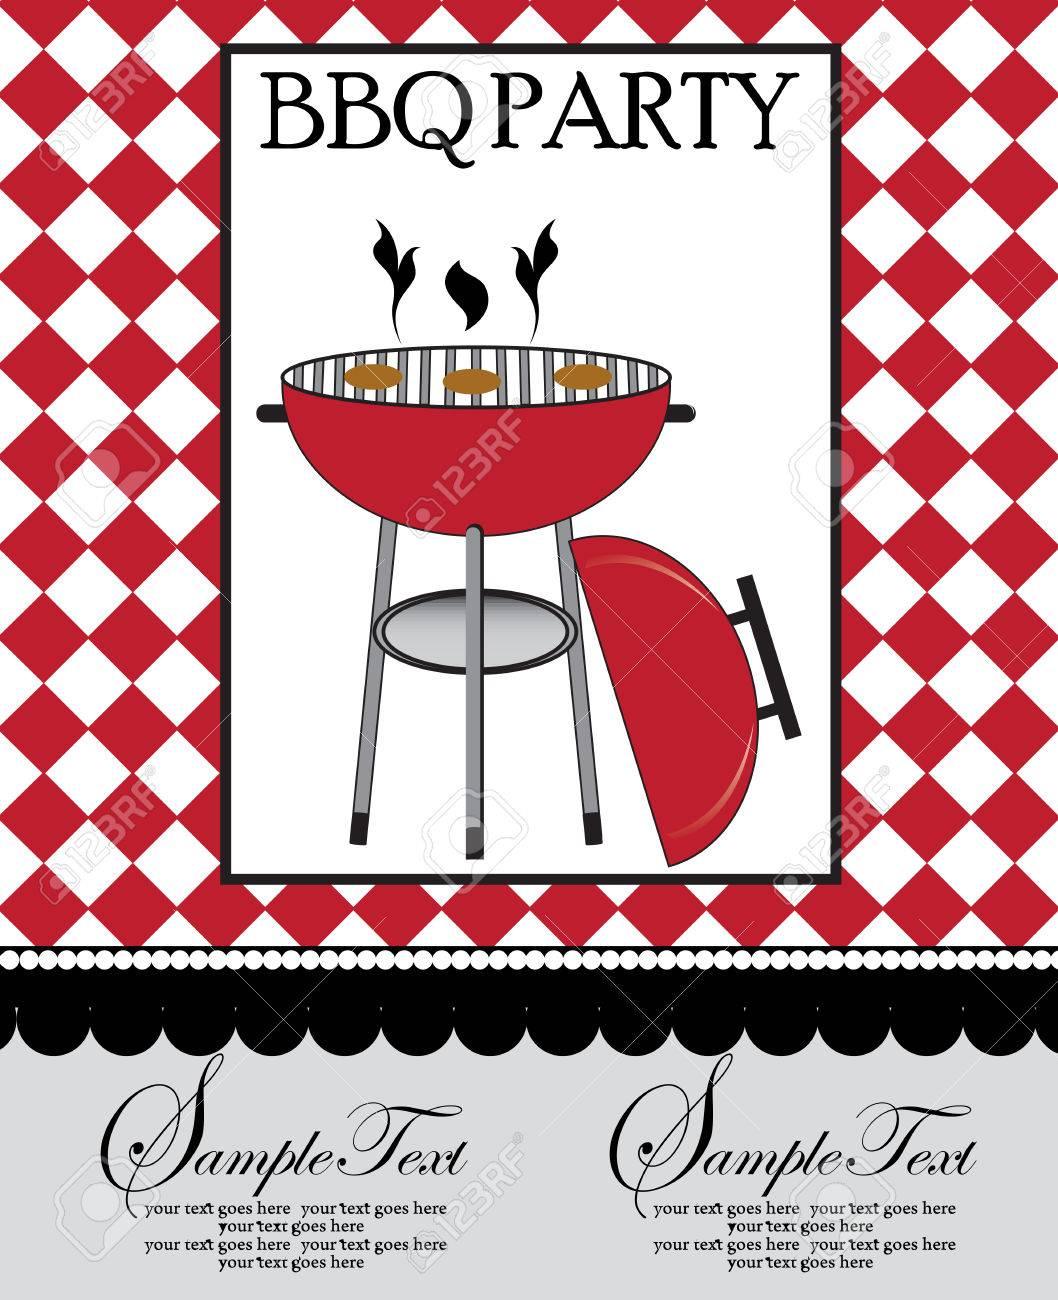 vintage barbecue party invitation card with ornate elegant retro